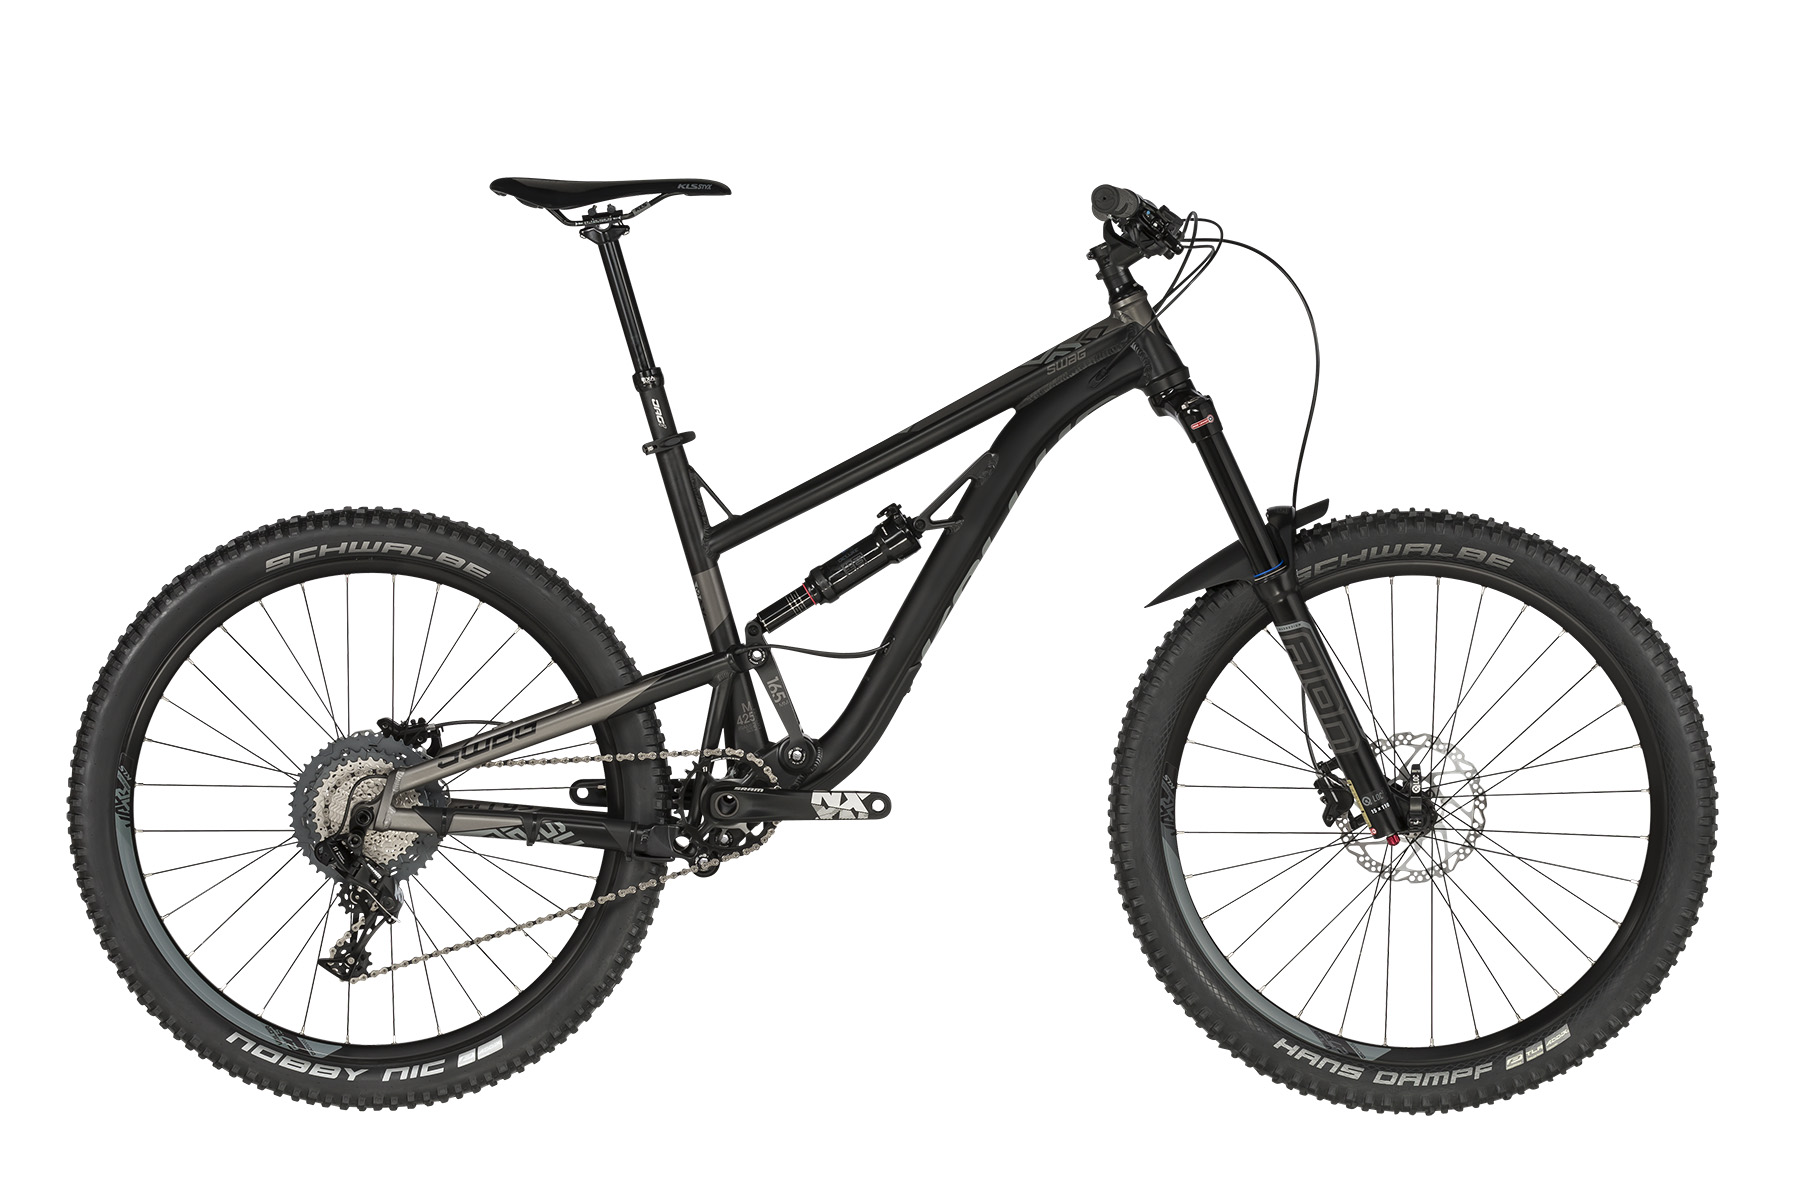 <strong>Bicicleta full suspension, </strong>cu telescop pe fata&nbsp;SR SUNTOUR Aion 35 LOR Boost, 160mm si telescop pe spate&nbsp;ROCK SHOX Deluxe RT, DebonAir / Rapid Recovery / Open-Pedal (230x65mm).</p><p><strong>Bicicleta de munte cu echipare&nbsp;SRAM NX,</strong> 11 viteze, o bicicleta recomandata pentru cei ce doresc sa experimenteze senzatii tari.</p><p><strong>frame</strong>&nbsp;KELLYS Enduro 27.5 / Think Link suspension system, 165mm rear travel, tapered HT, internal routing, 12x148mm Boost thru axle<br /><strong>frame size</strong>&nbsp;S / M / L<br /><strong>fork</strong>&nbsp;SR SUNTOUR Aion 35 LOR (27.5) Boost, 160mm, air / Speed Lockout / 15Q-Loc thru axle<br /><strong>rear shock</strong>&nbsp;ROCK SHOX Deluxe RT, DebonAir / Rapid Recovery / Open-Pedal (230x65mm)<br /><strong>head parts</strong>&nbsp;FSA 1.5 integrated<br /><strong>b.b.parts</strong>&nbsp;SRAM PressFit GXP<br /><strong>crankset</strong>&nbsp;SRAM NX 1x X-Sync (30) - length 175mm<br /><strong>shifters</strong>&nbsp;SRAM NX 11-Speed X-Actuation Trigger<br /><strong>r/derailleur</strong>&nbsp;SRAM NX 1x11 X-Horizon<br /><strong>speed</strong>&nbsp;11<br /><strong>cassette sprocket</strong>&nbsp;SHIMANO CS-M7000-11 (11-46)<br /><strong>chain</strong>&nbsp;KMC X11 (110 links)<br /><strong>brakes</strong>&nbsp;SHIMANO MT400 Hydraulic Disc<br /><strong>brake rotors</strong>&nbsp;180mm front / 180mm rear<br /><strong>brake levers</strong>&nbsp;SHIMANO BL-MT400<br /><strong>hubs</strong>&nbsp;SHIMANO MT400-B Disc Center Lock (15x110mm / 12x148mm / 32 holes)<br /><strong>thru axle</strong>&nbsp;SR SUNTOUR Q-Loc 15x110mm front / Mr.CONTROL 12x148mm rear<br /><strong>rims</strong>&nbsp;KLS Valor 2 Disc 584x27 (32 holes)<br /><strong>spokes</strong>&nbsp;stainless steel black<br /><strong>tires</strong>&nbsp;SCHWALBE Hans Dampf Performance 60-584 (27.5x2.35) Tubeless Ready, ADDIX, folding front / SCHWALBE Nobby Nic Performance 60-584 (27.5x2.35) ADDIX, folding rear<br /><strong>stem</strong>&nbs